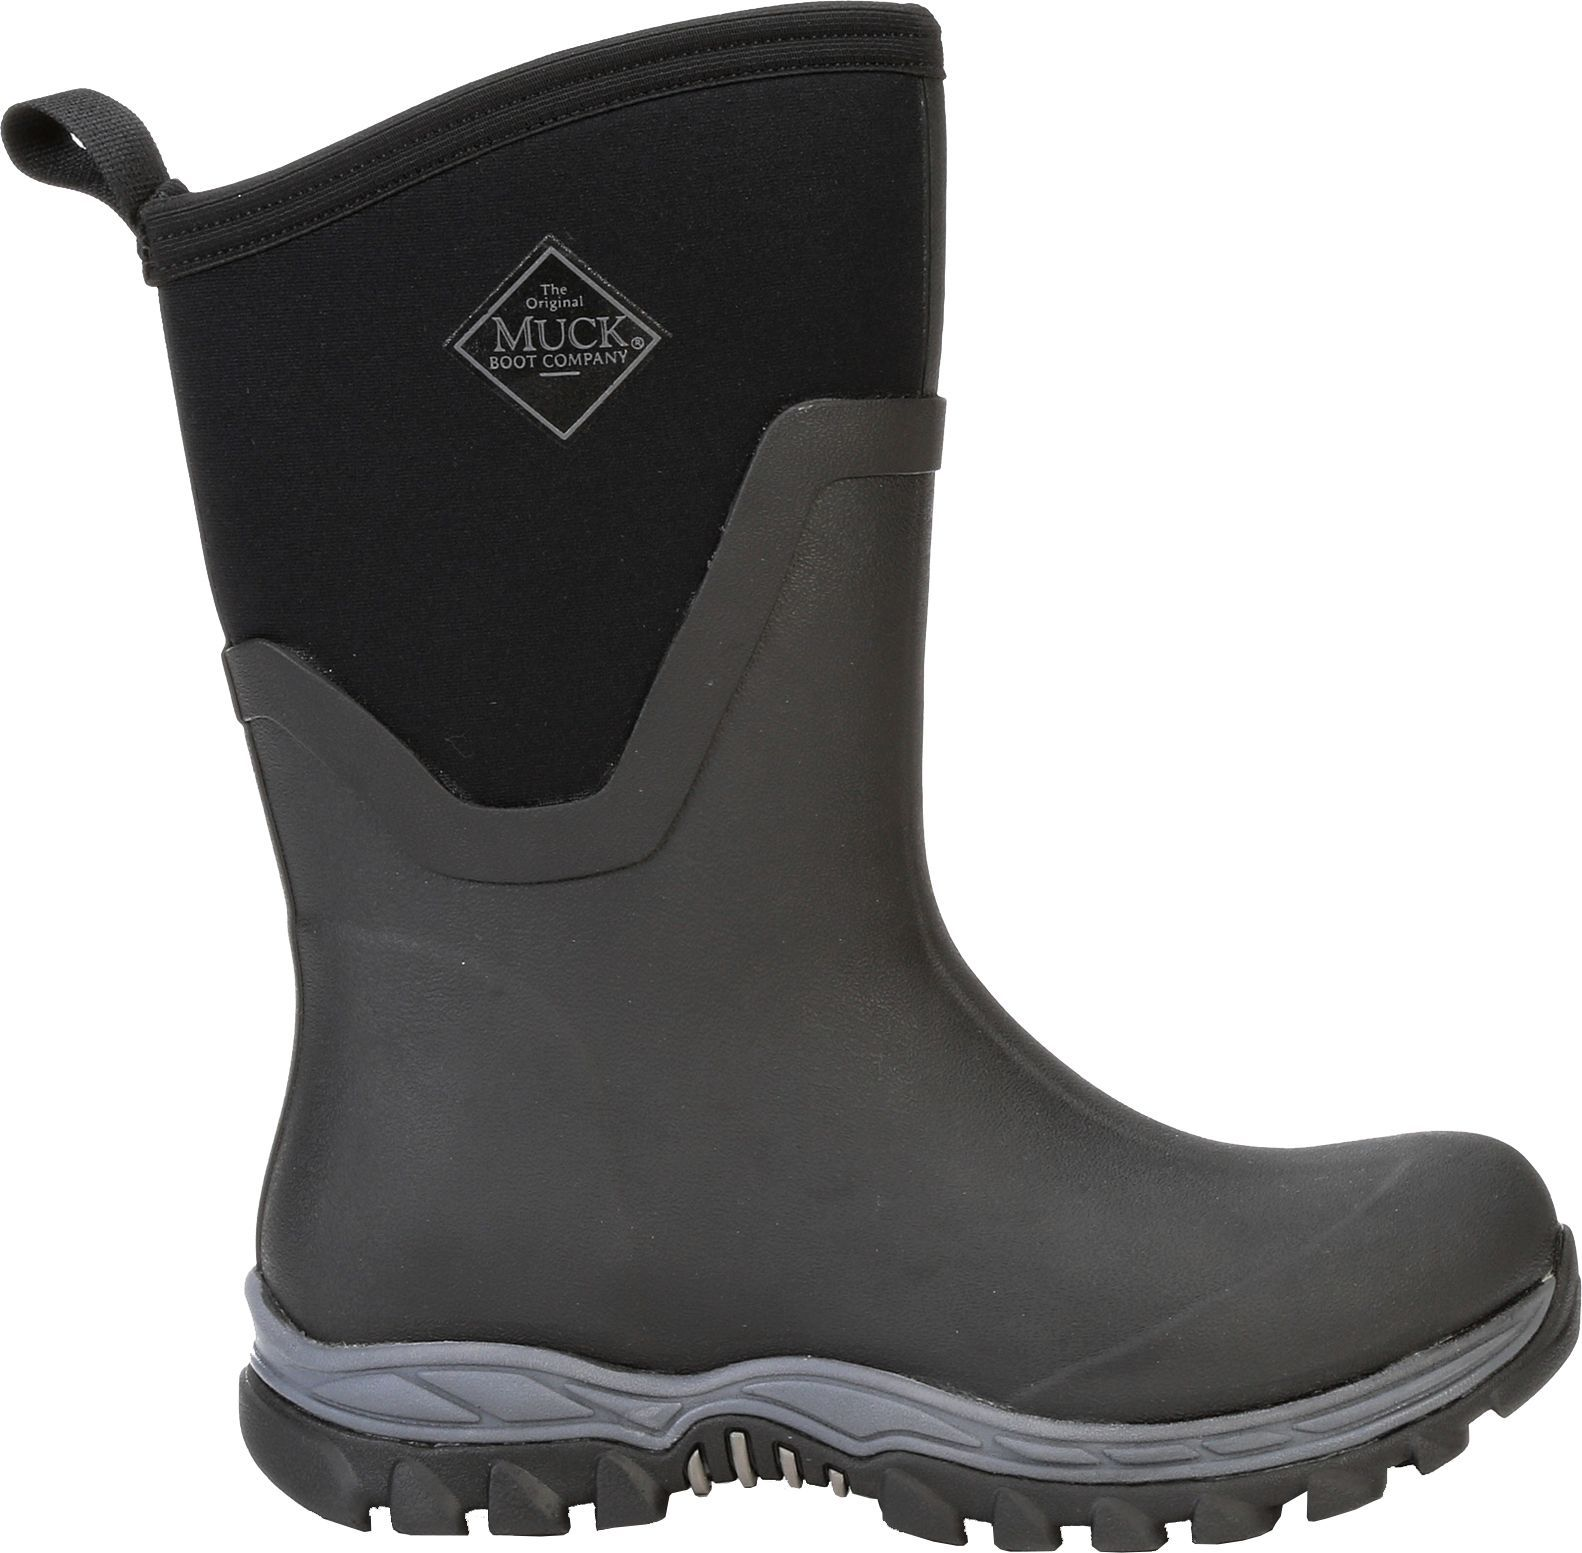 Muck Boots Women's Arctic Sport II Mid Winter Boots, Size